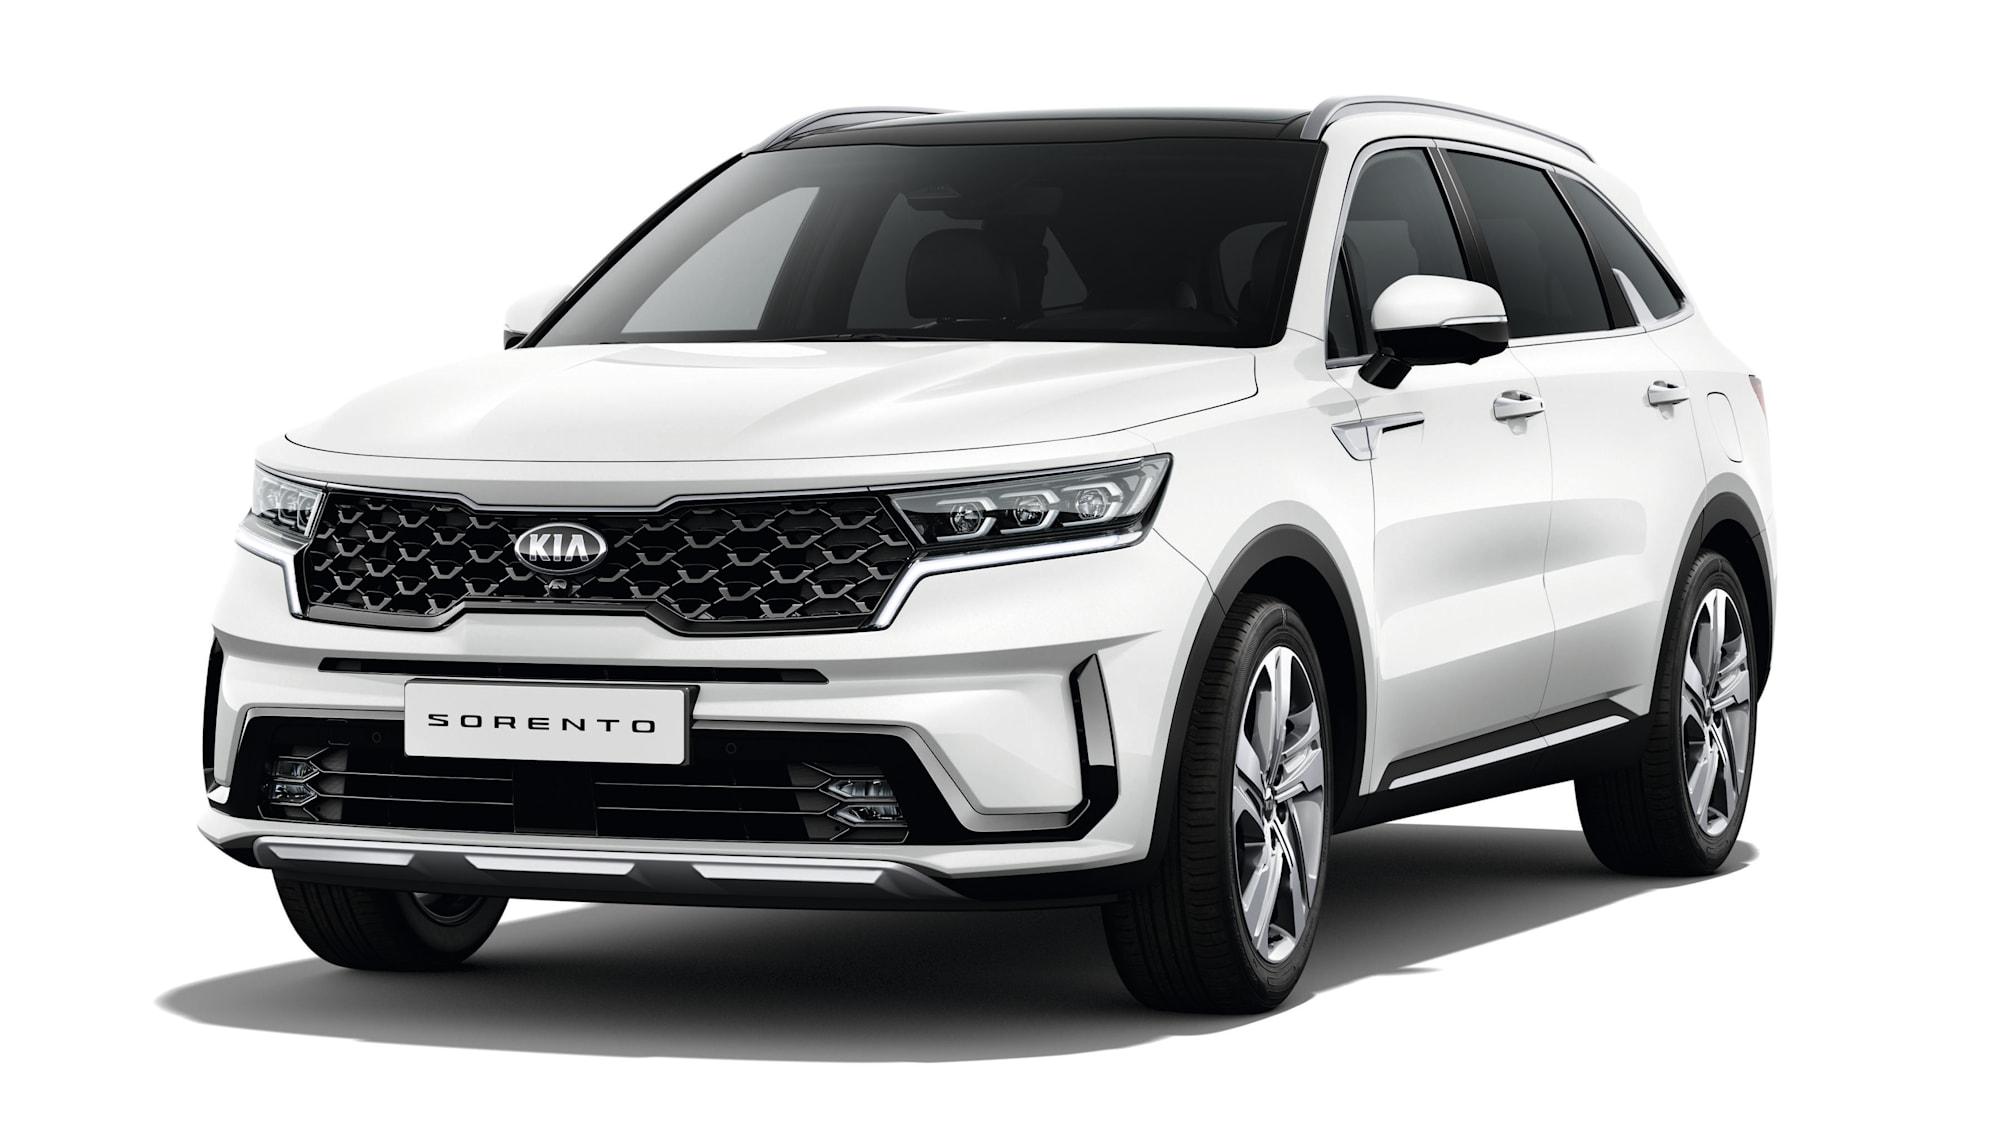 2021 Kia Sorento price and specs | CarAdvice